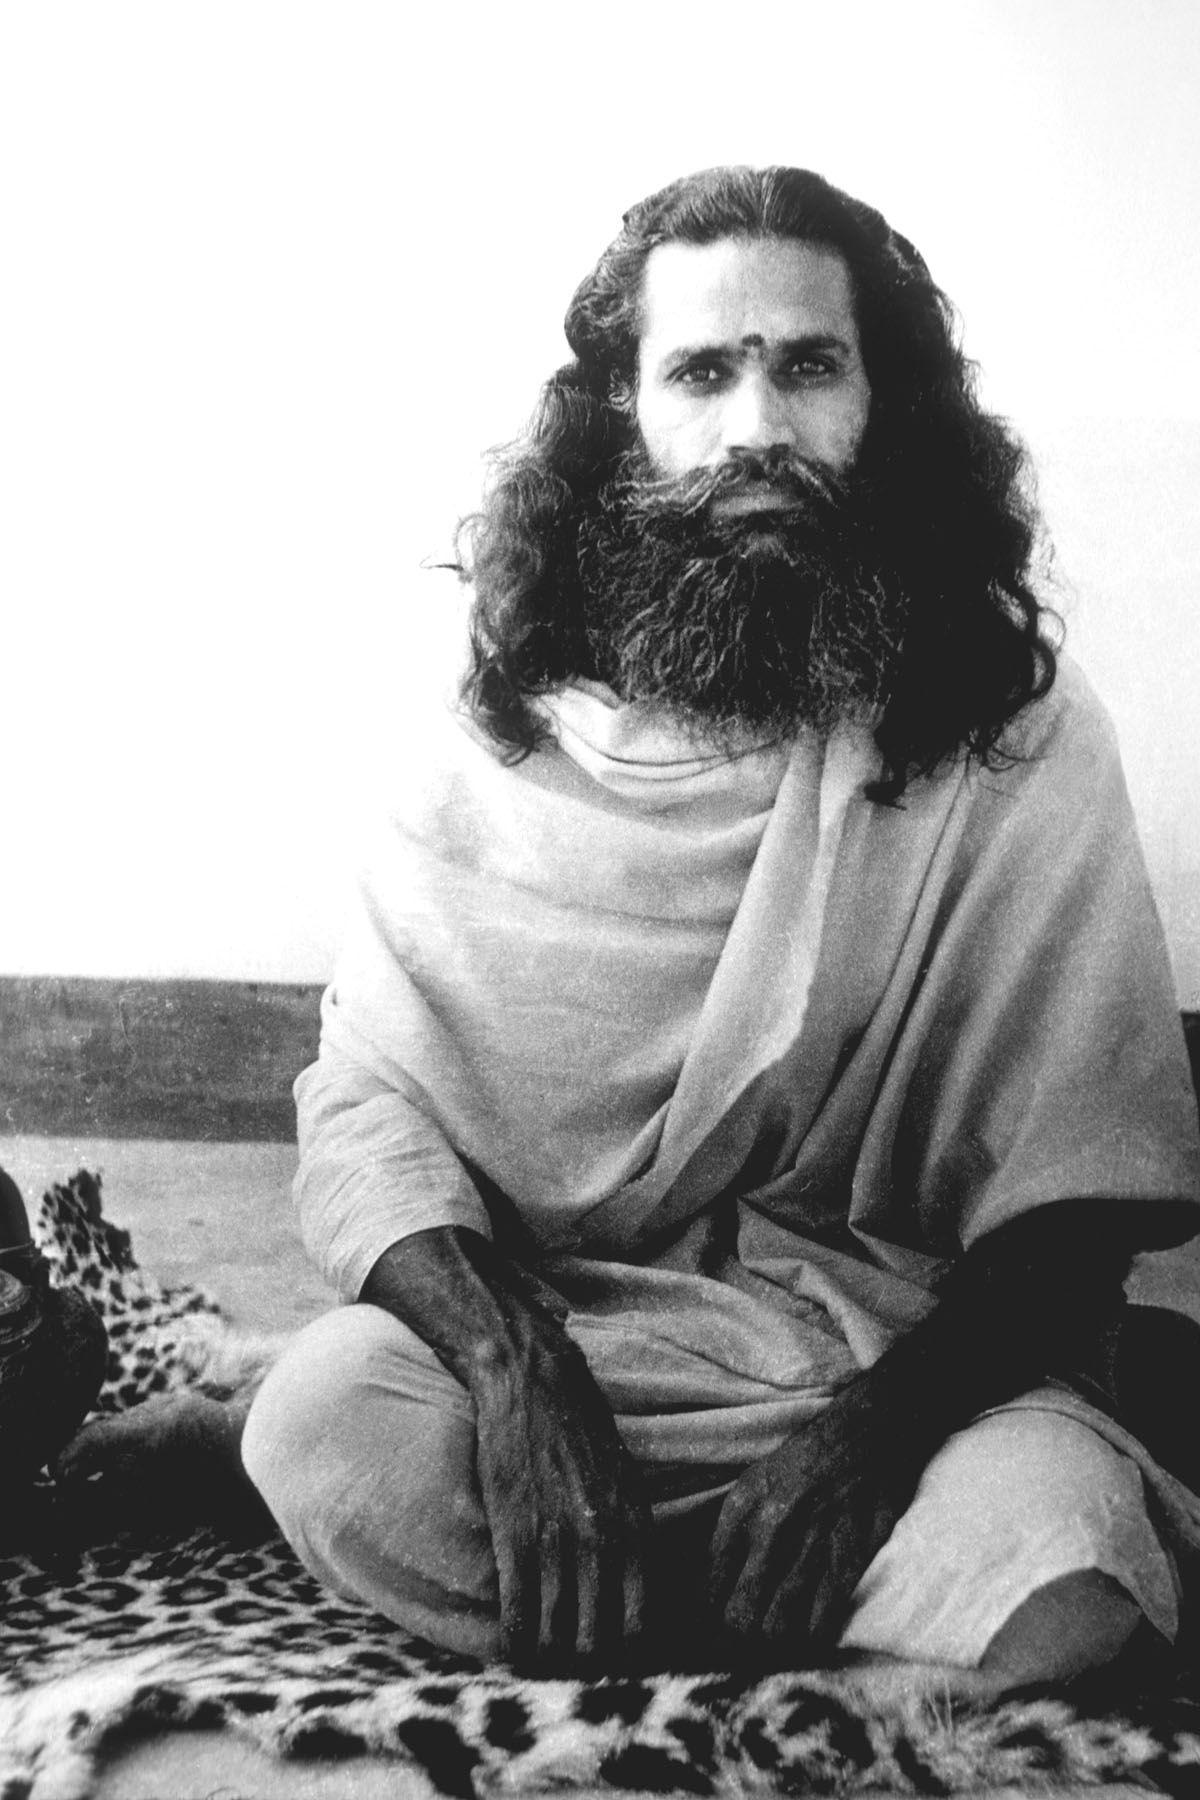 Swami Satchidananda as a young sannyasi (monk) in India